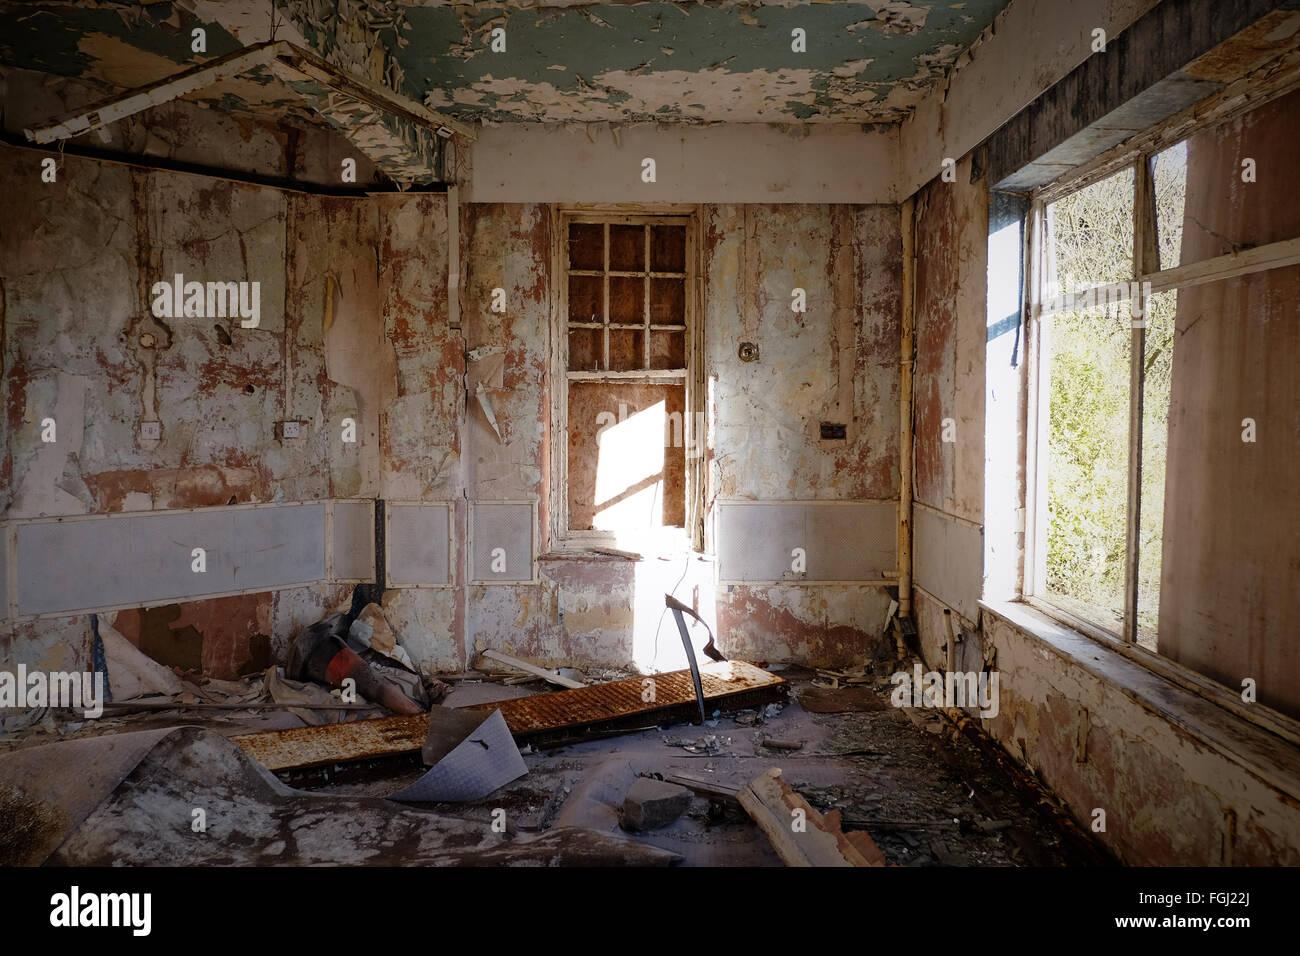 An Abandoned Room In Harperbury Hospital Harper Lane Shenley UK